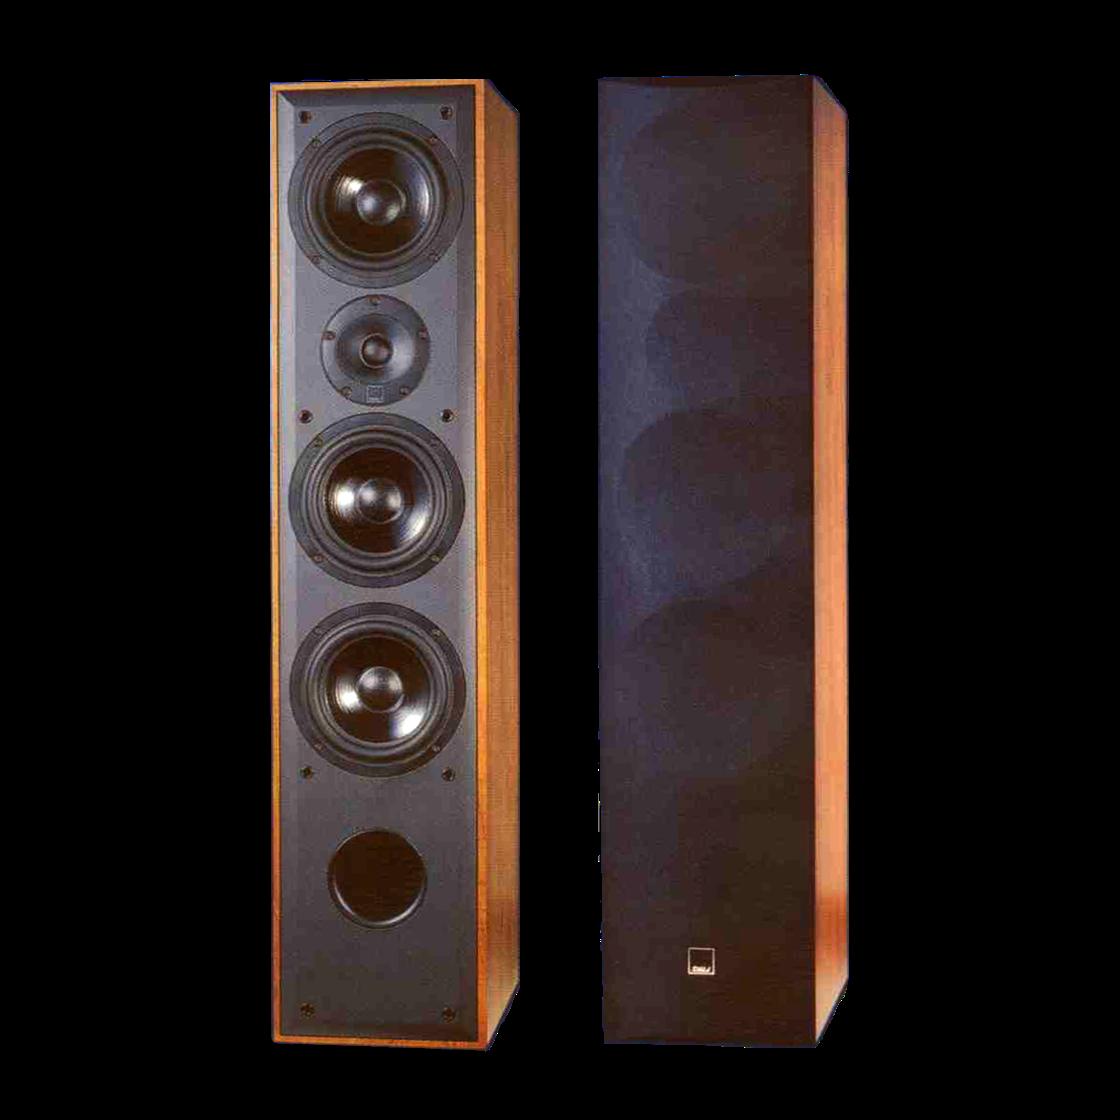 Blue Subwoofer Wiring On Speaker Bi Amplifier And Home Cinema 6006